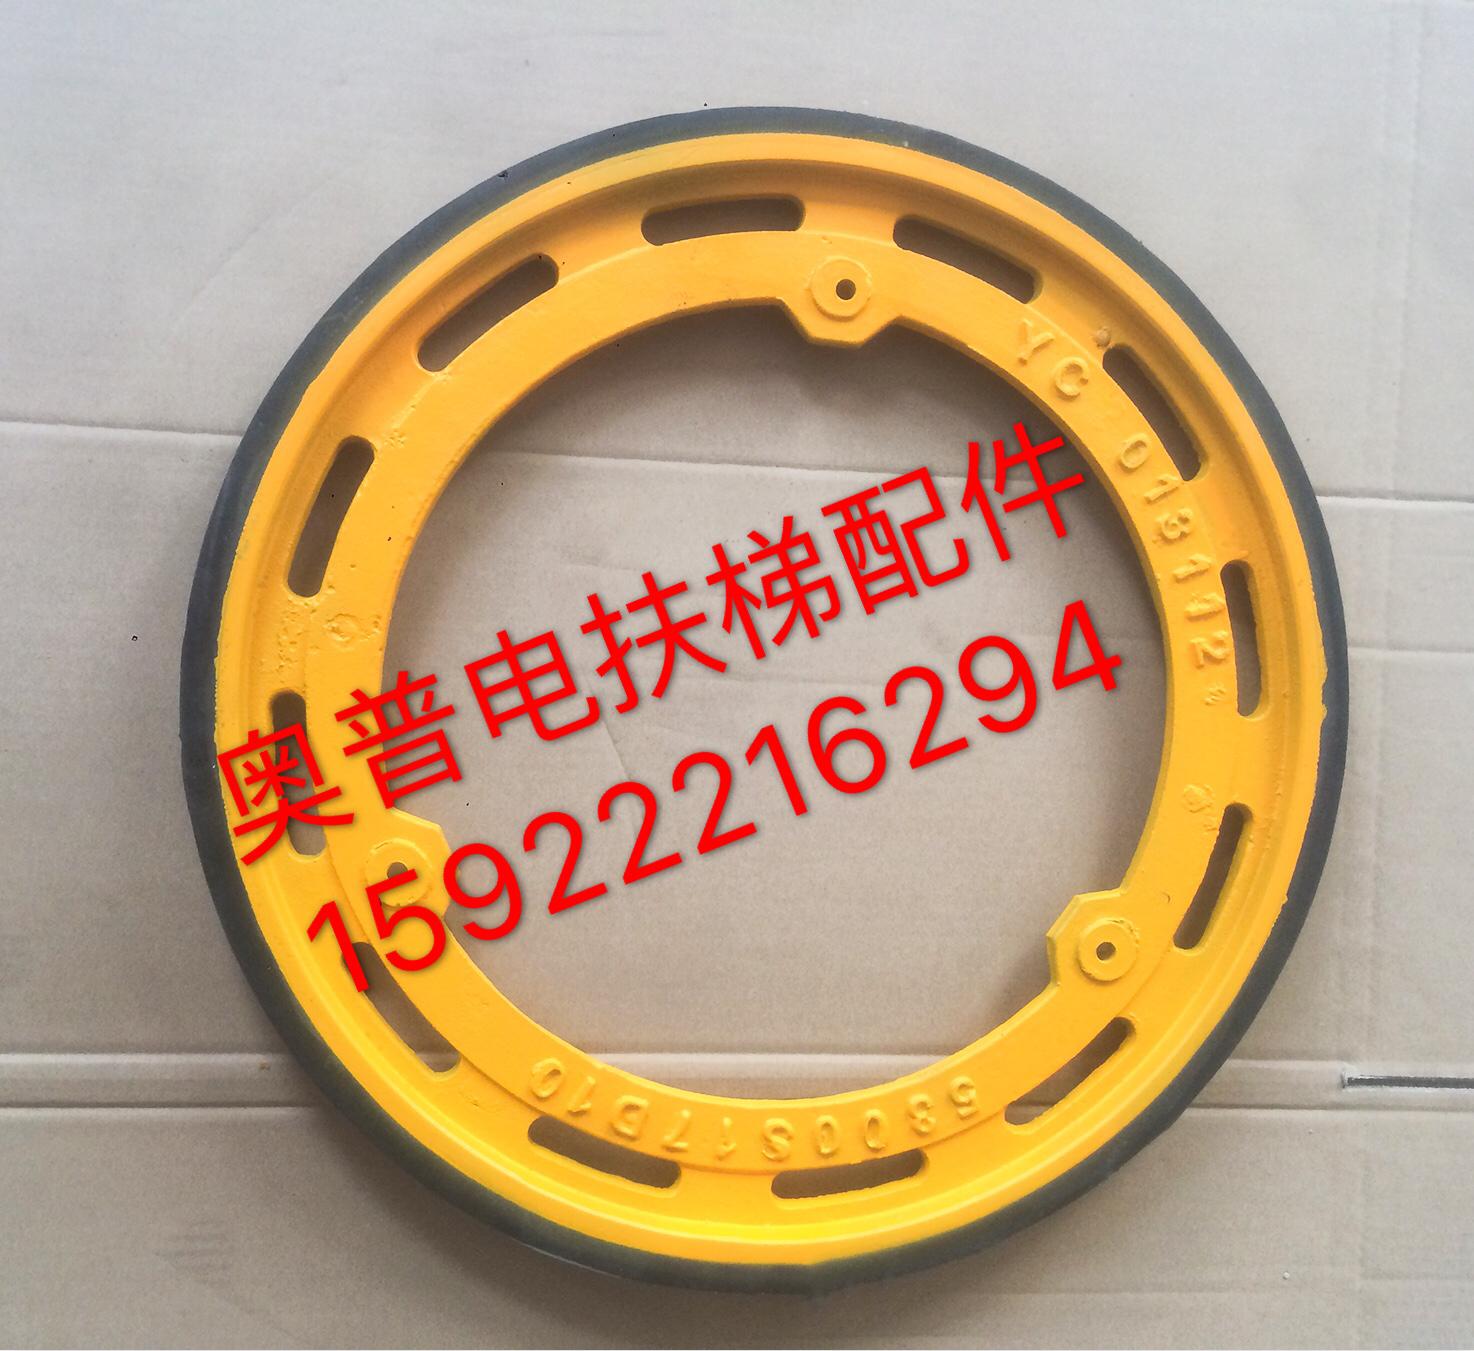 Elevator friction wheel / Schindler 9300 escalator friction wheel / new type friction wheel 3 hole /498*30* middle hole 400